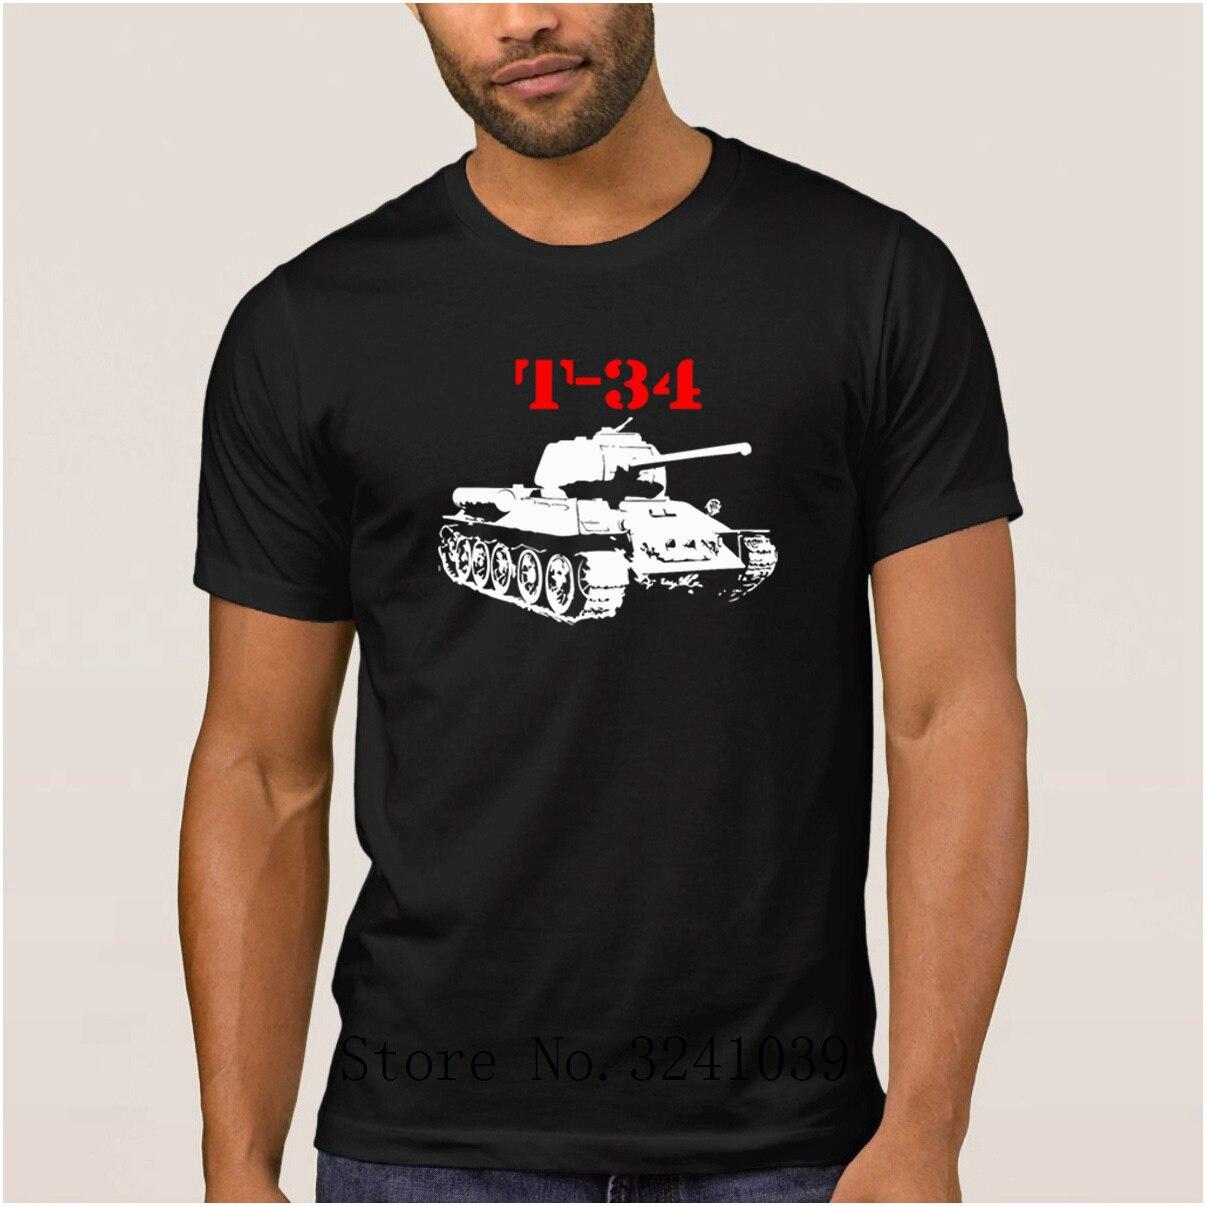 Anlarach punto divertido t 34 Ruso ruso Segunda Guerra Mundial camiseta verano Fitness camiseta para hombres camiseta única para hombre cuello redondo